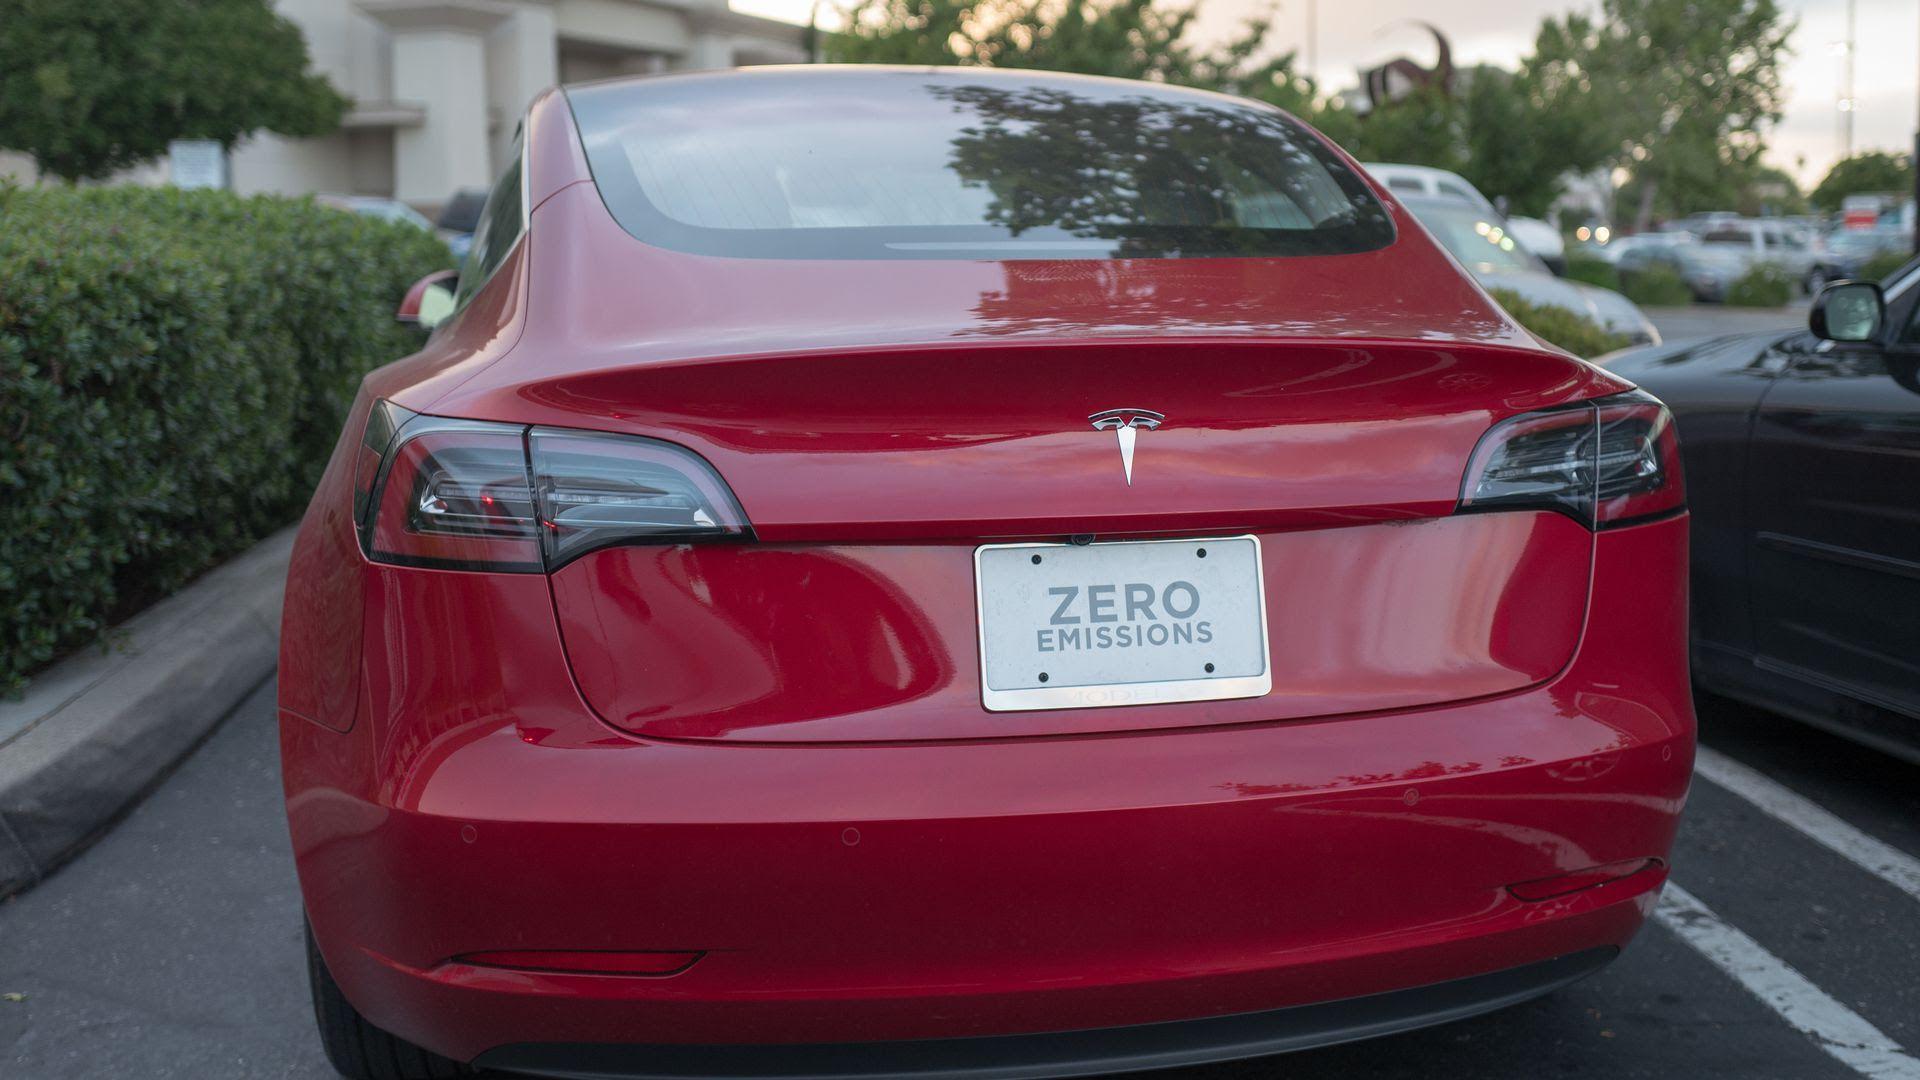 GM is eating Tesla's exhaust - Axios